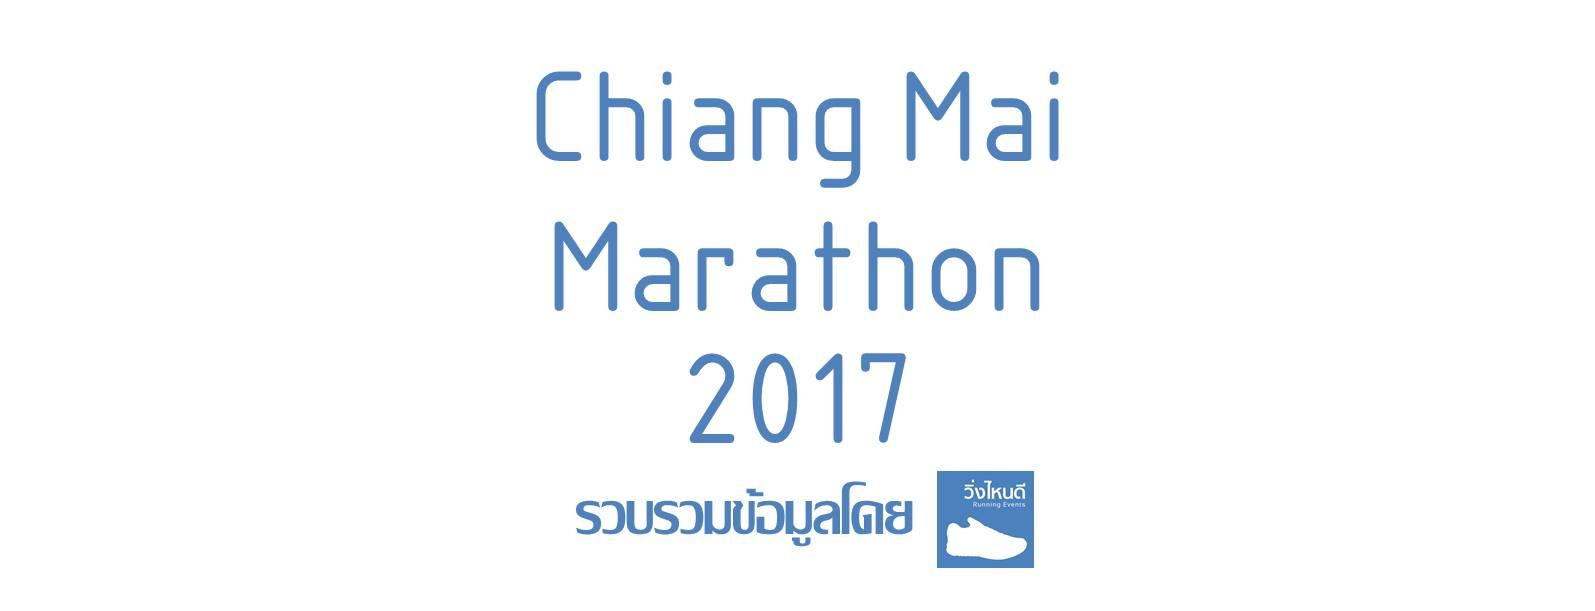 Chiang Mai Marathon 2017